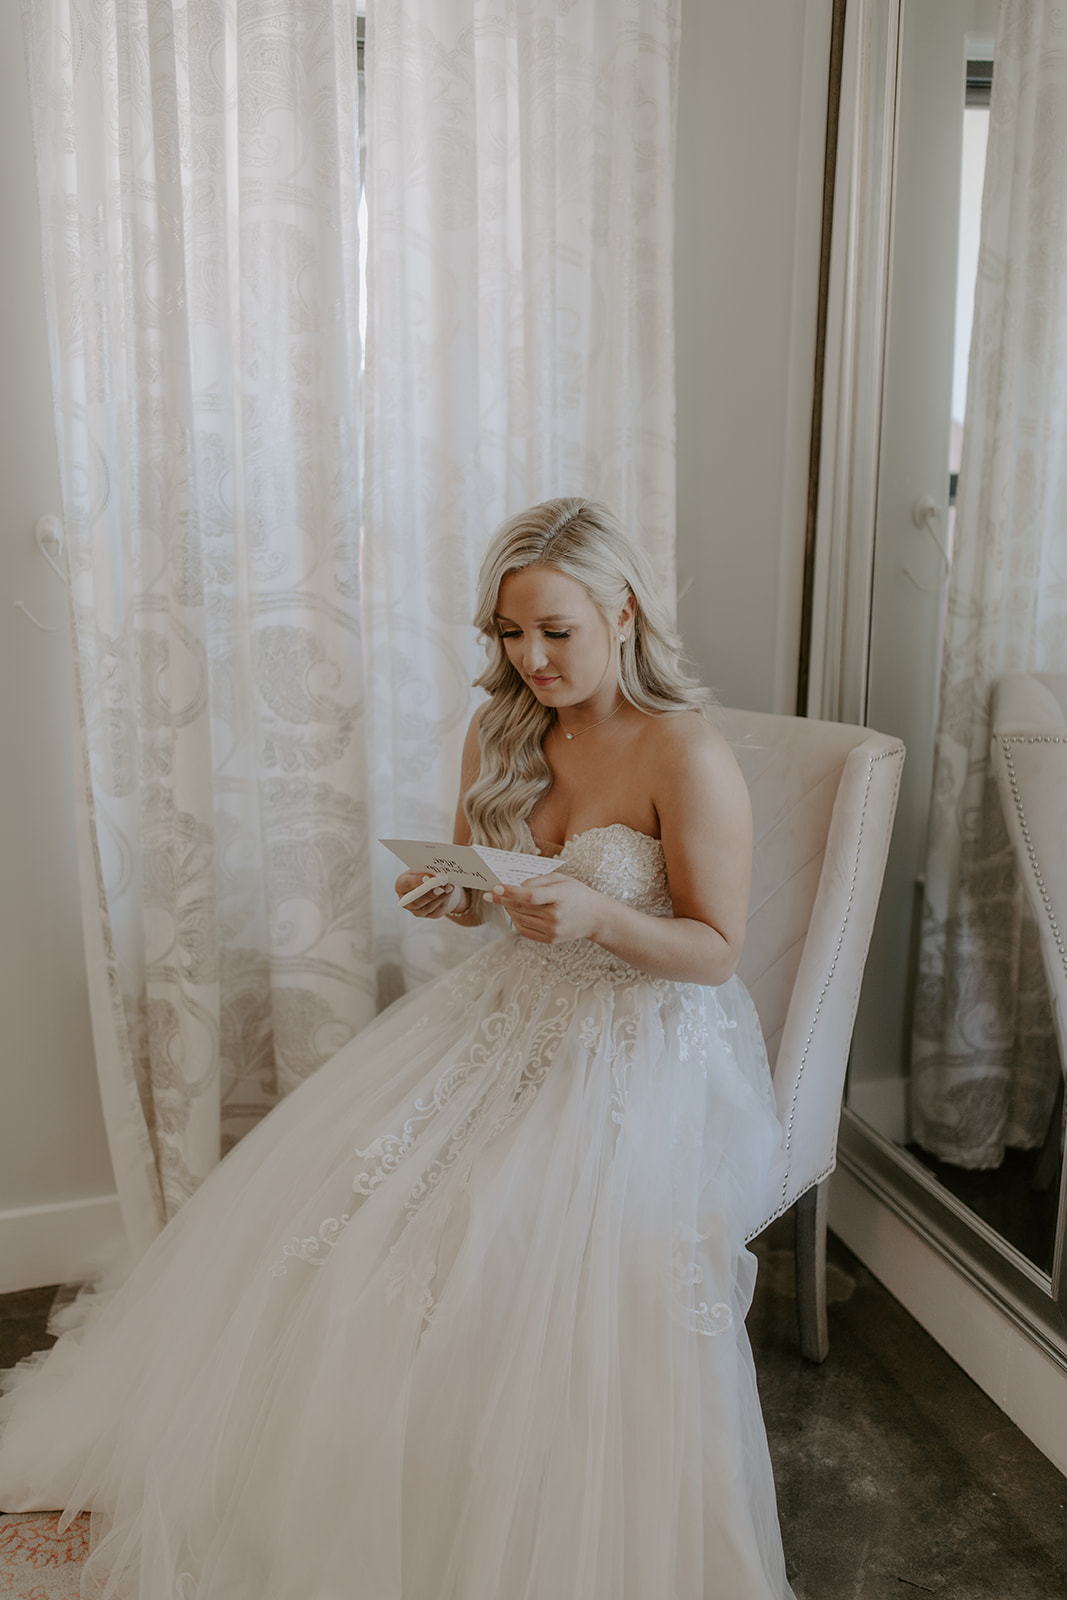 wedding venues tulsa bixby white barn 17c.jpg